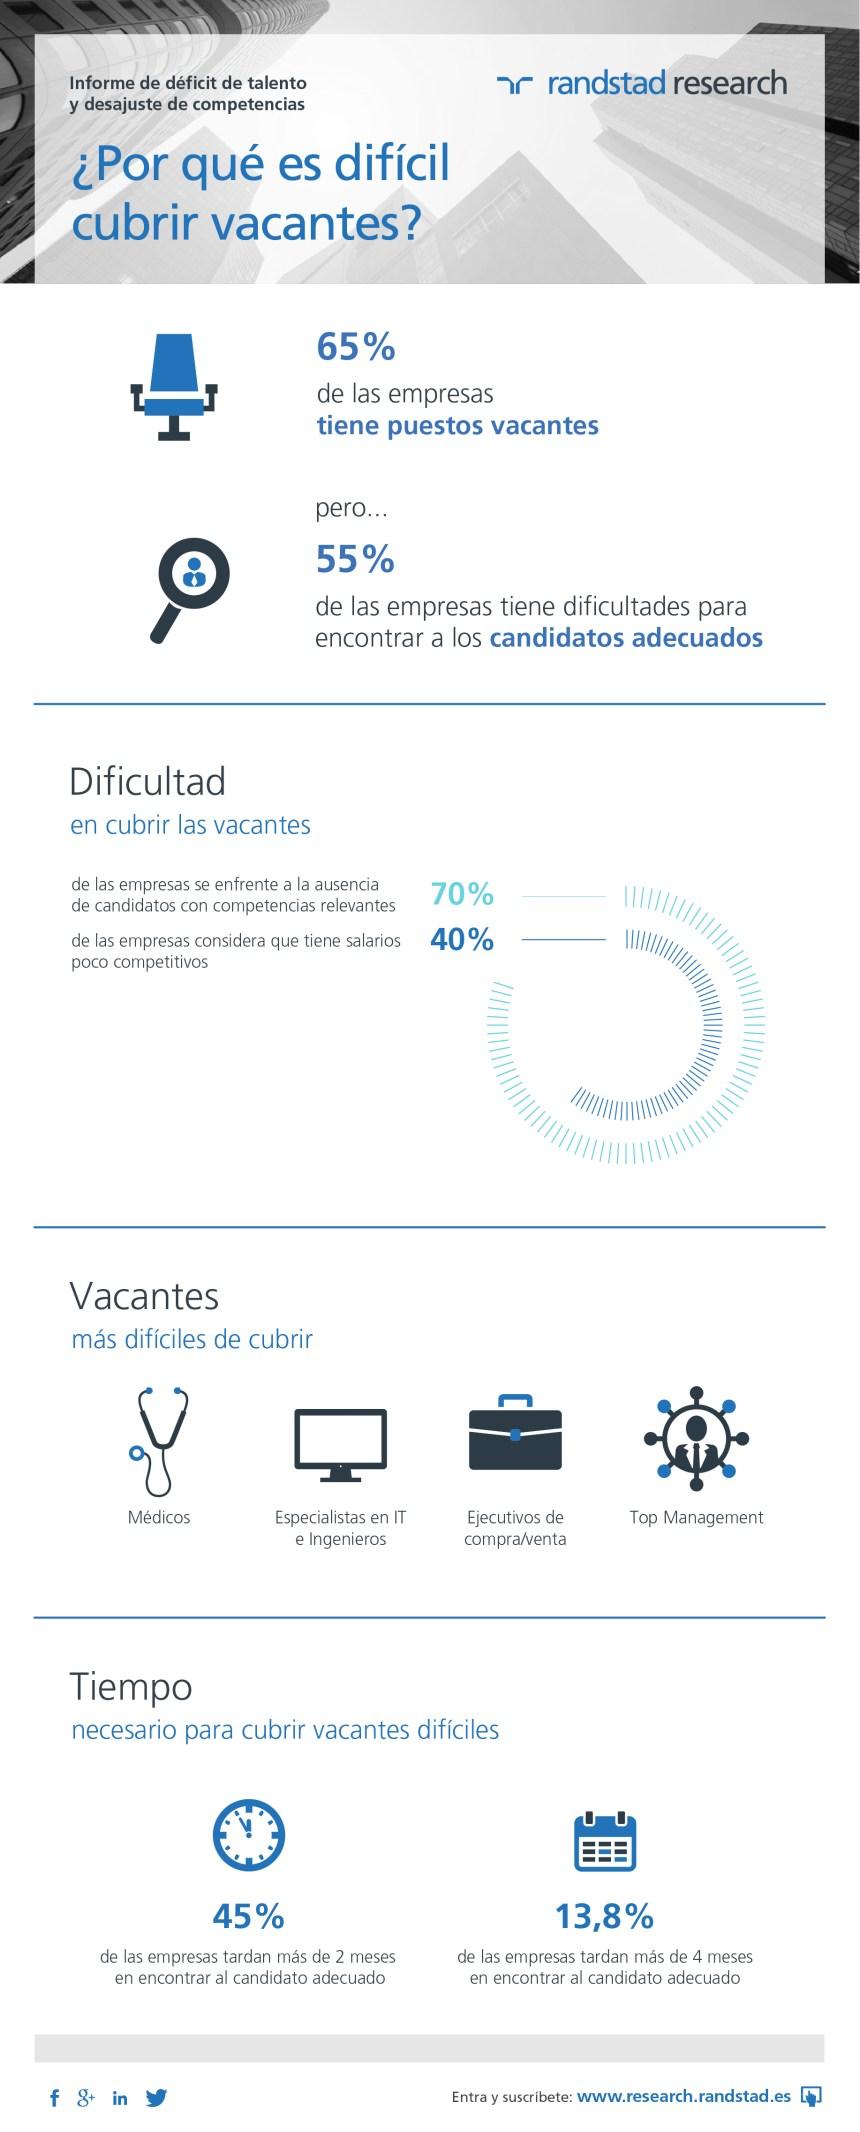 Talento: vacantes difíciles de cubrir en España